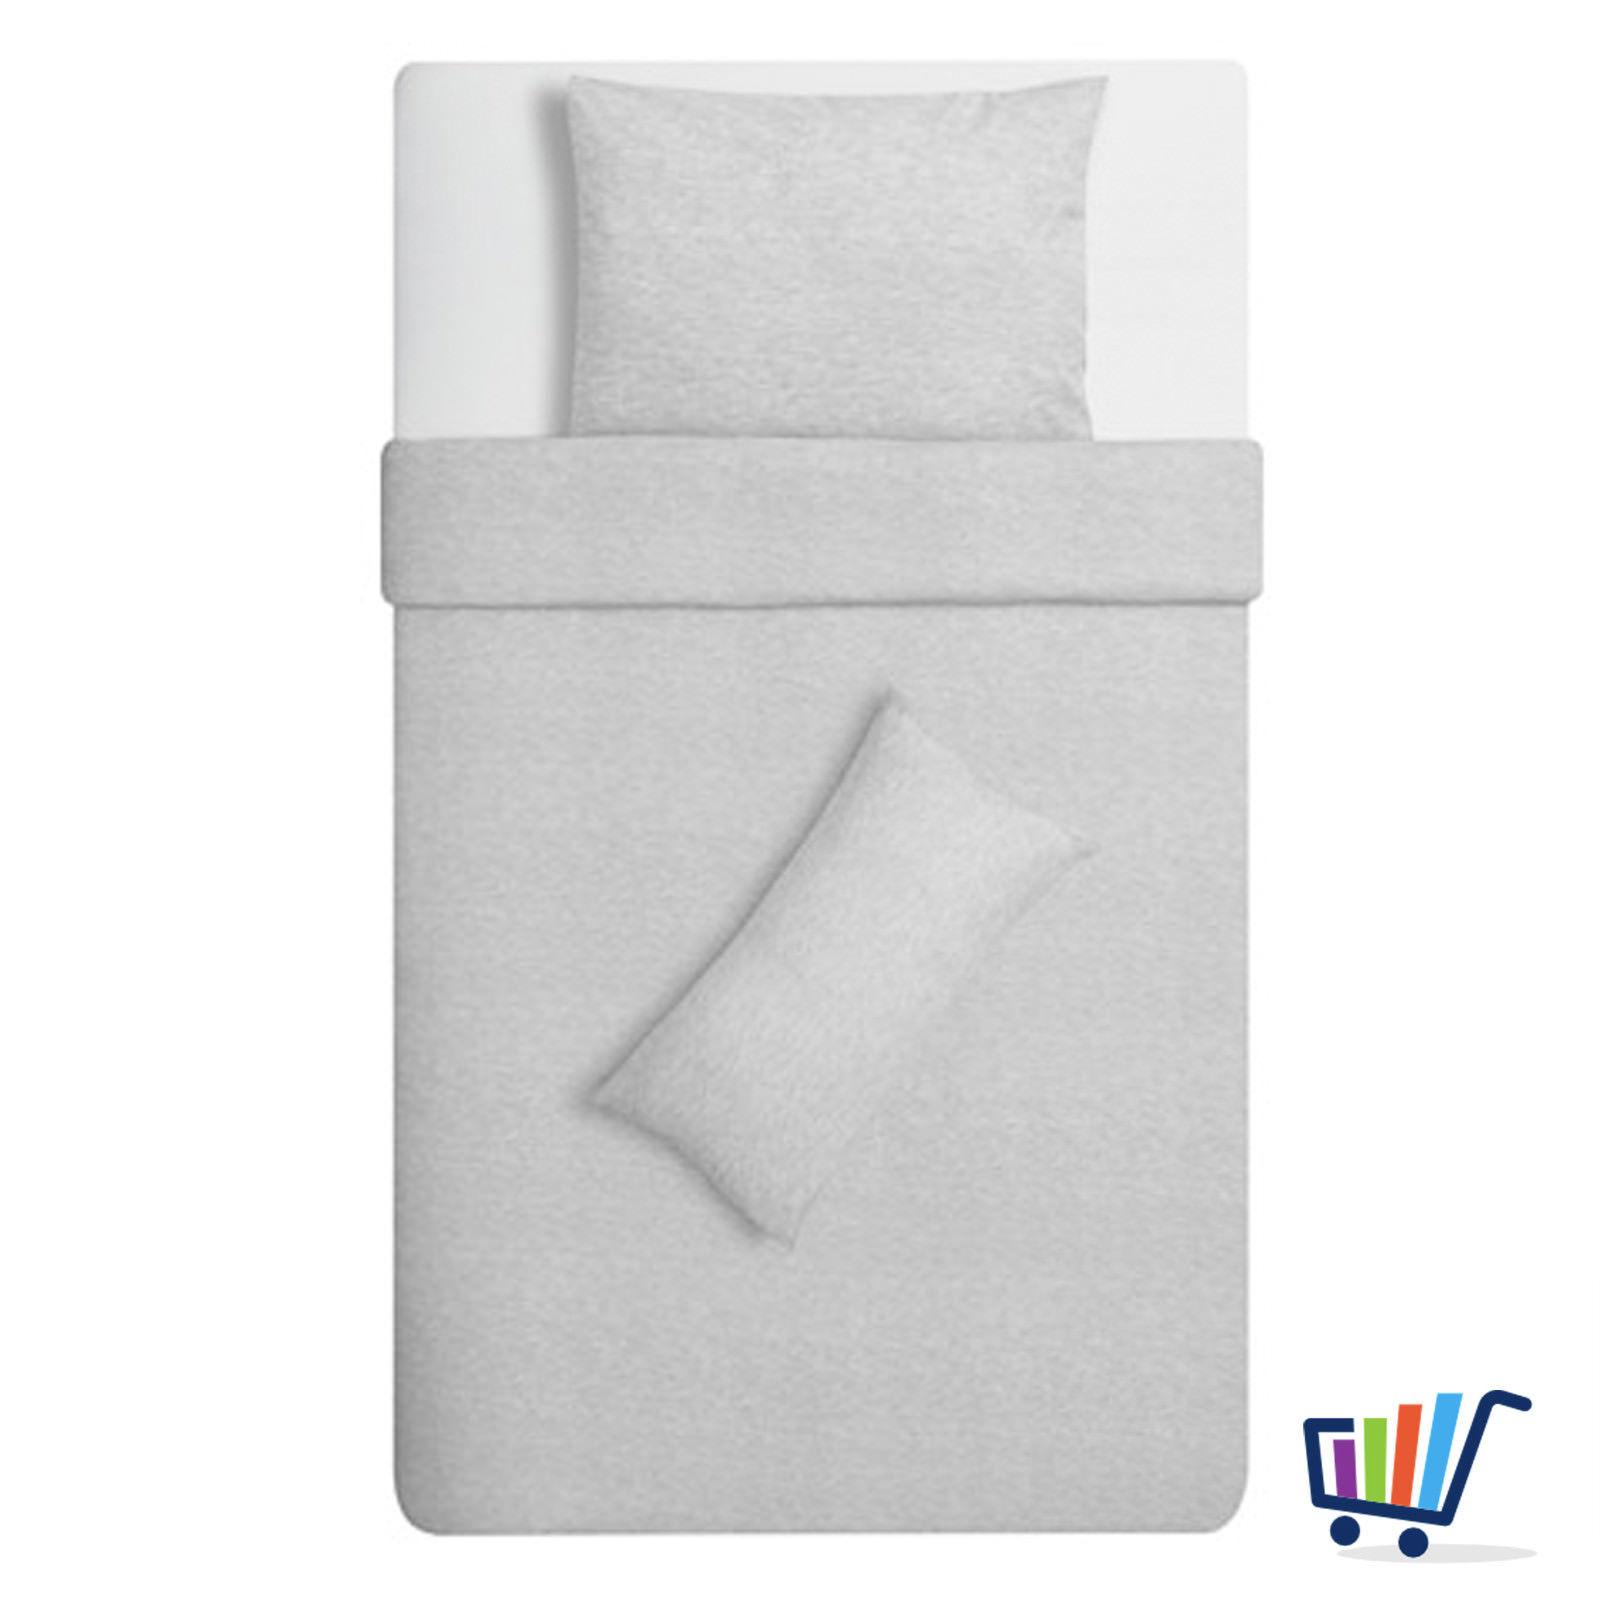 ikea blasstarr 155 220 cm 3 tlg jersey premium bettw sche set grau bettbezug neu traumfabrik xxl. Black Bedroom Furniture Sets. Home Design Ideas